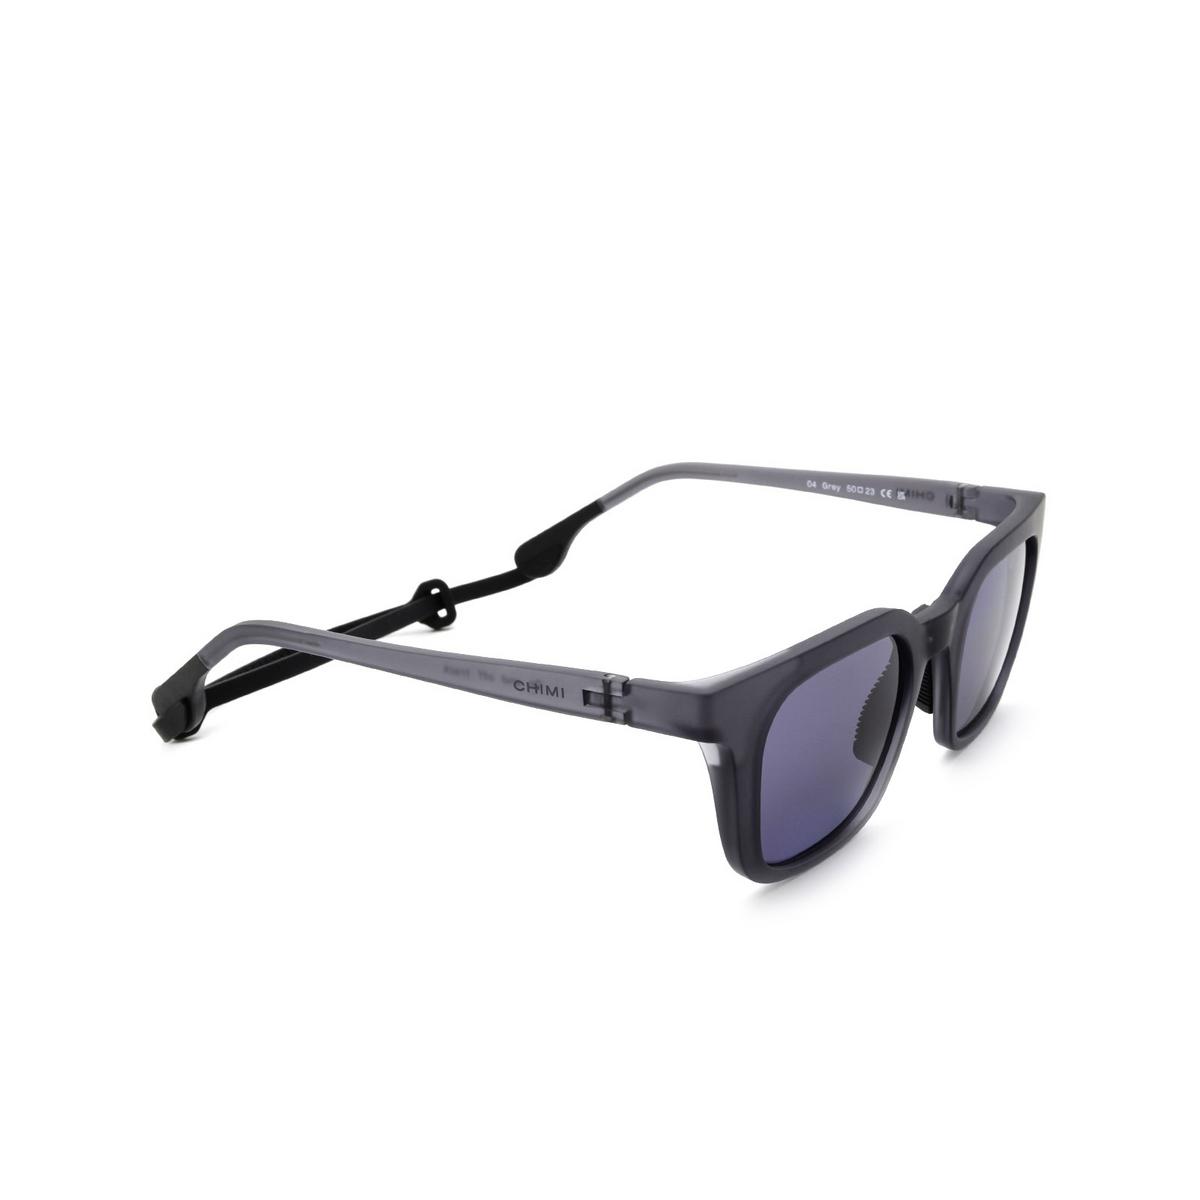 Chimi® Square Sunglasses: 04 ACTIVE color Grey - three-quarters view.